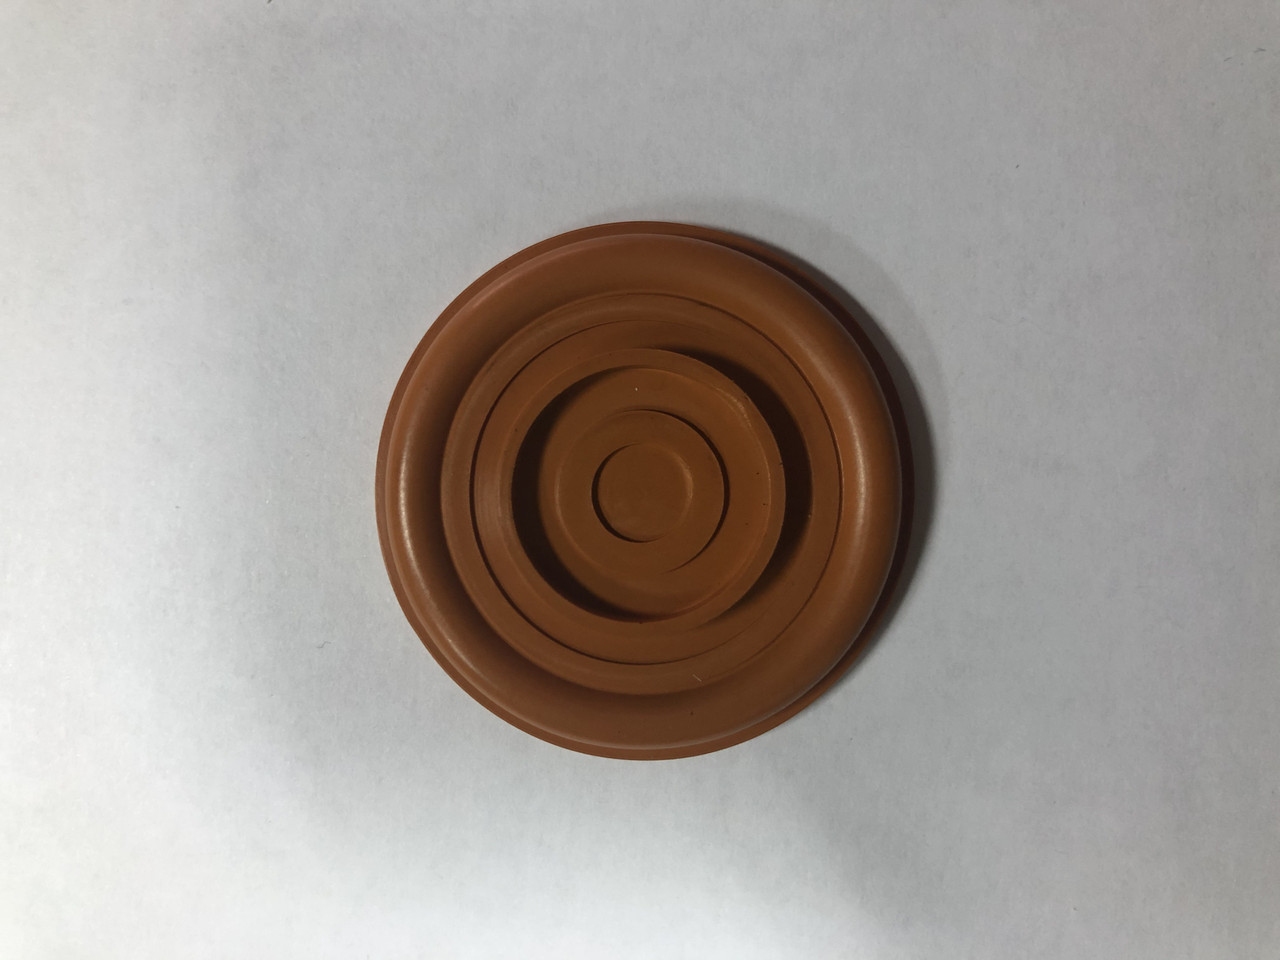 Мембрана клапанной крышки GM (Opel) 5607229, 55596087, 55569822, 55590970, 55590969